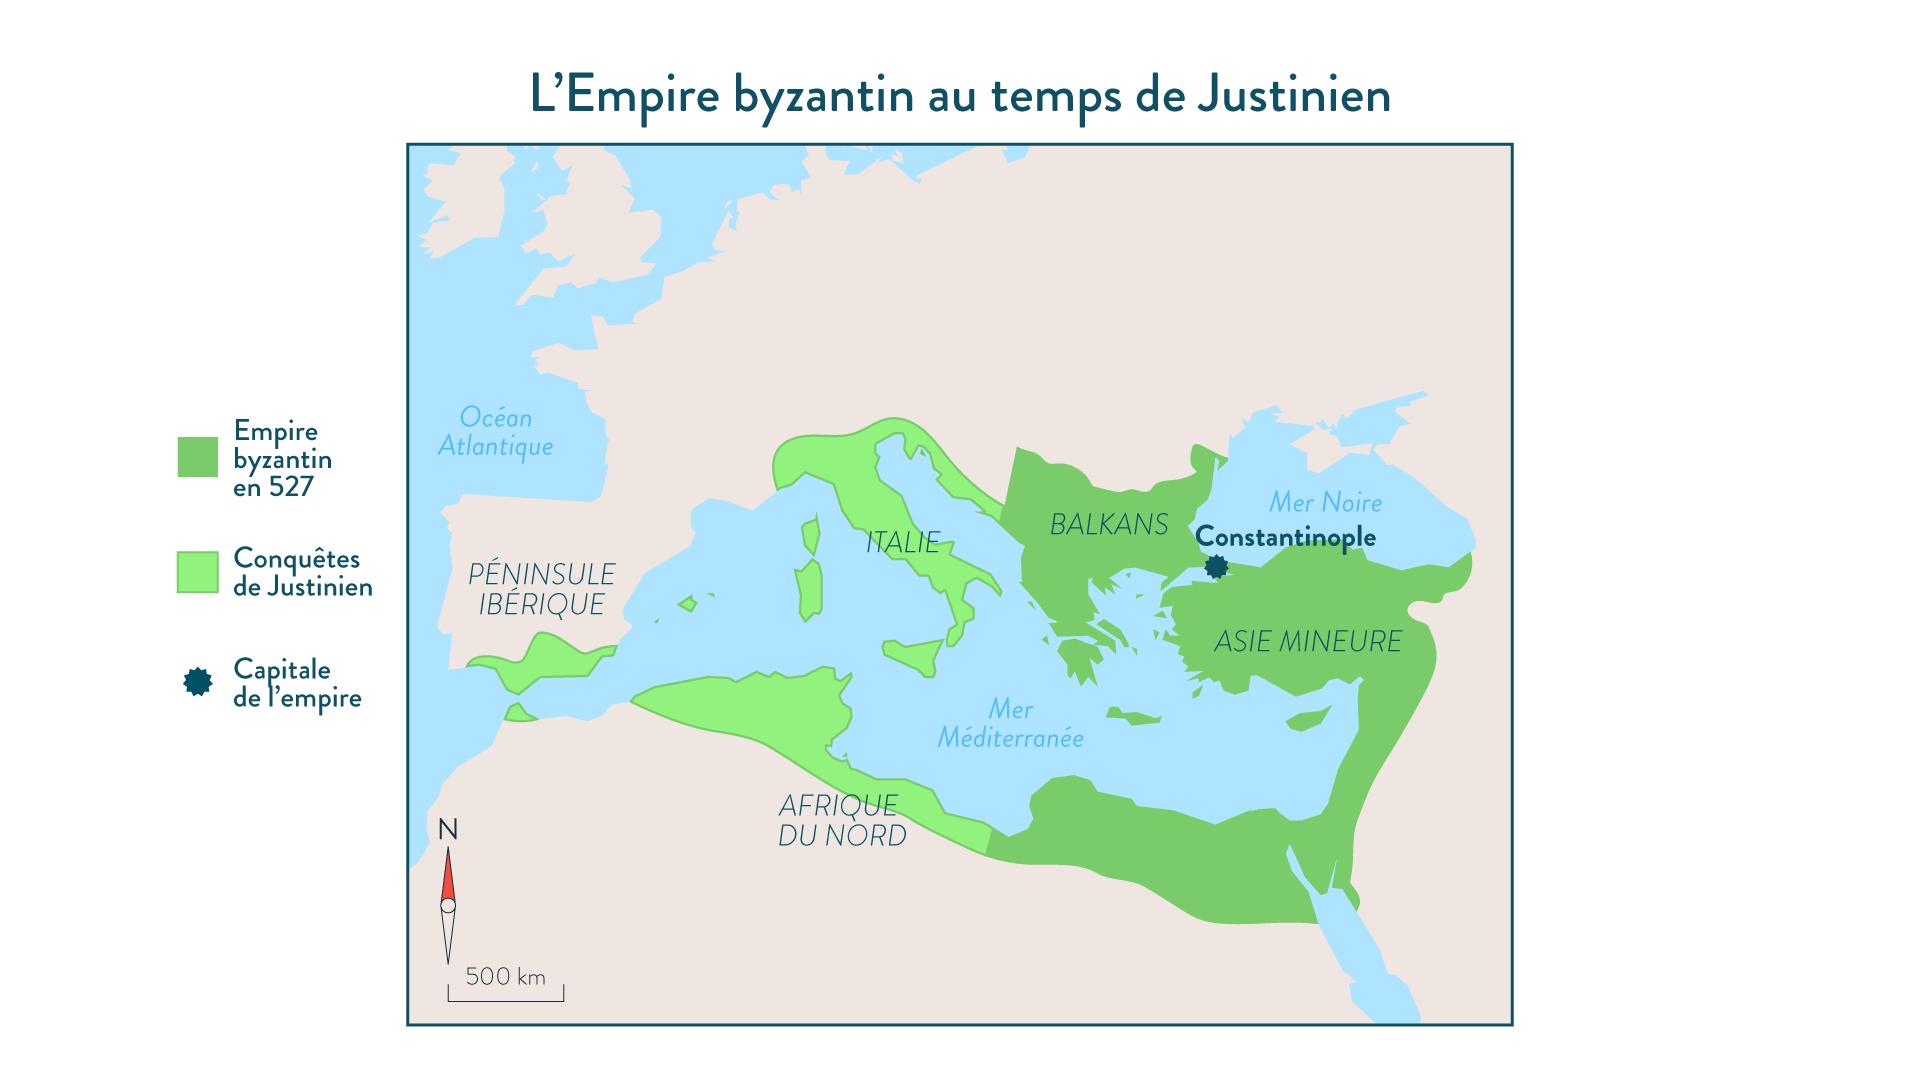 L'Empire byzantin au temps de Justinien - 5e - Histoire